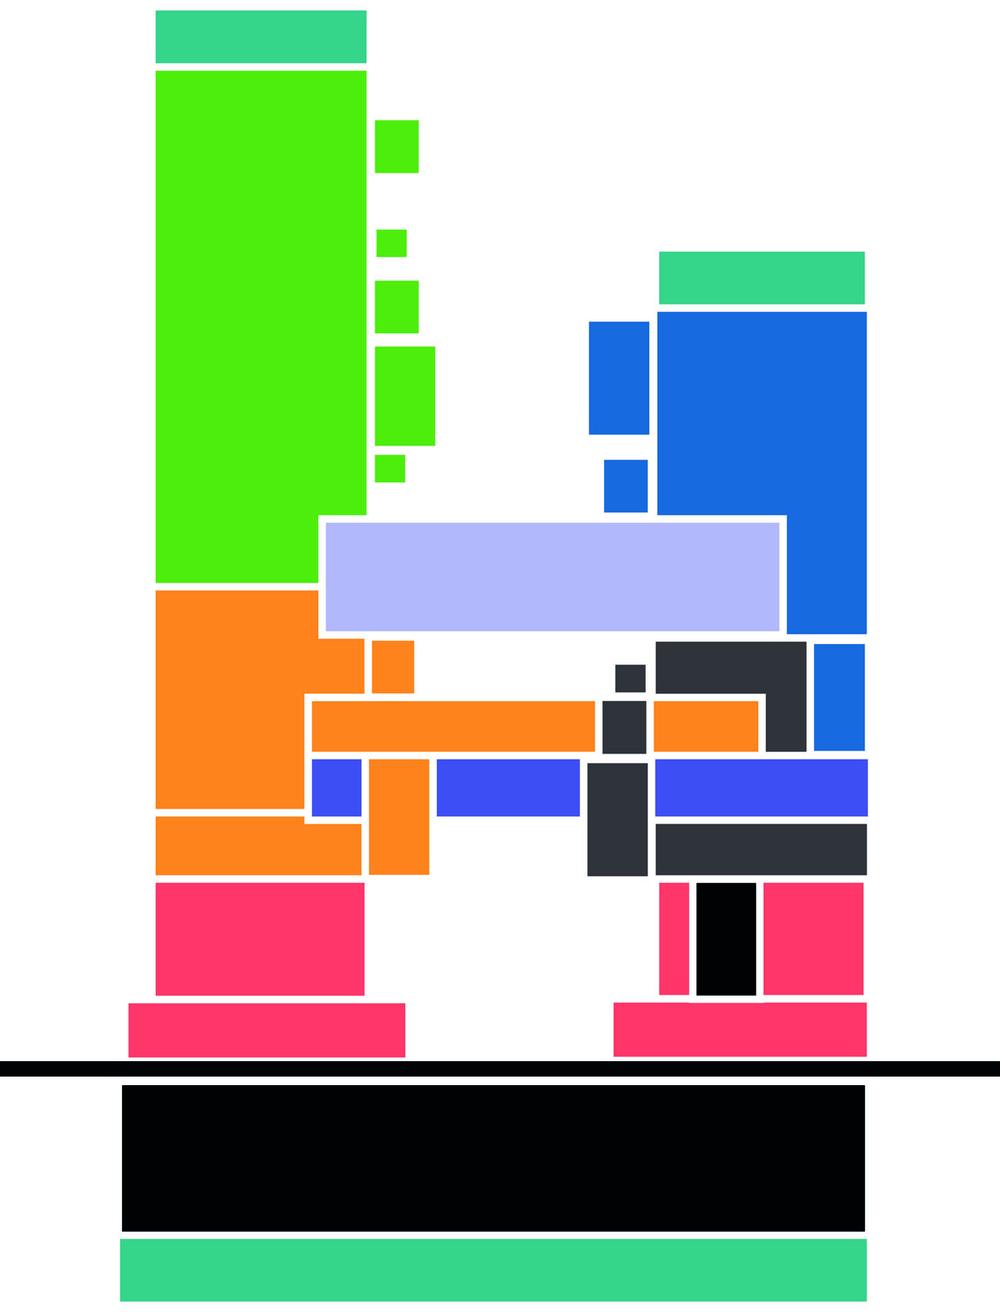 pulltowers-sectiondiagram01.jpg